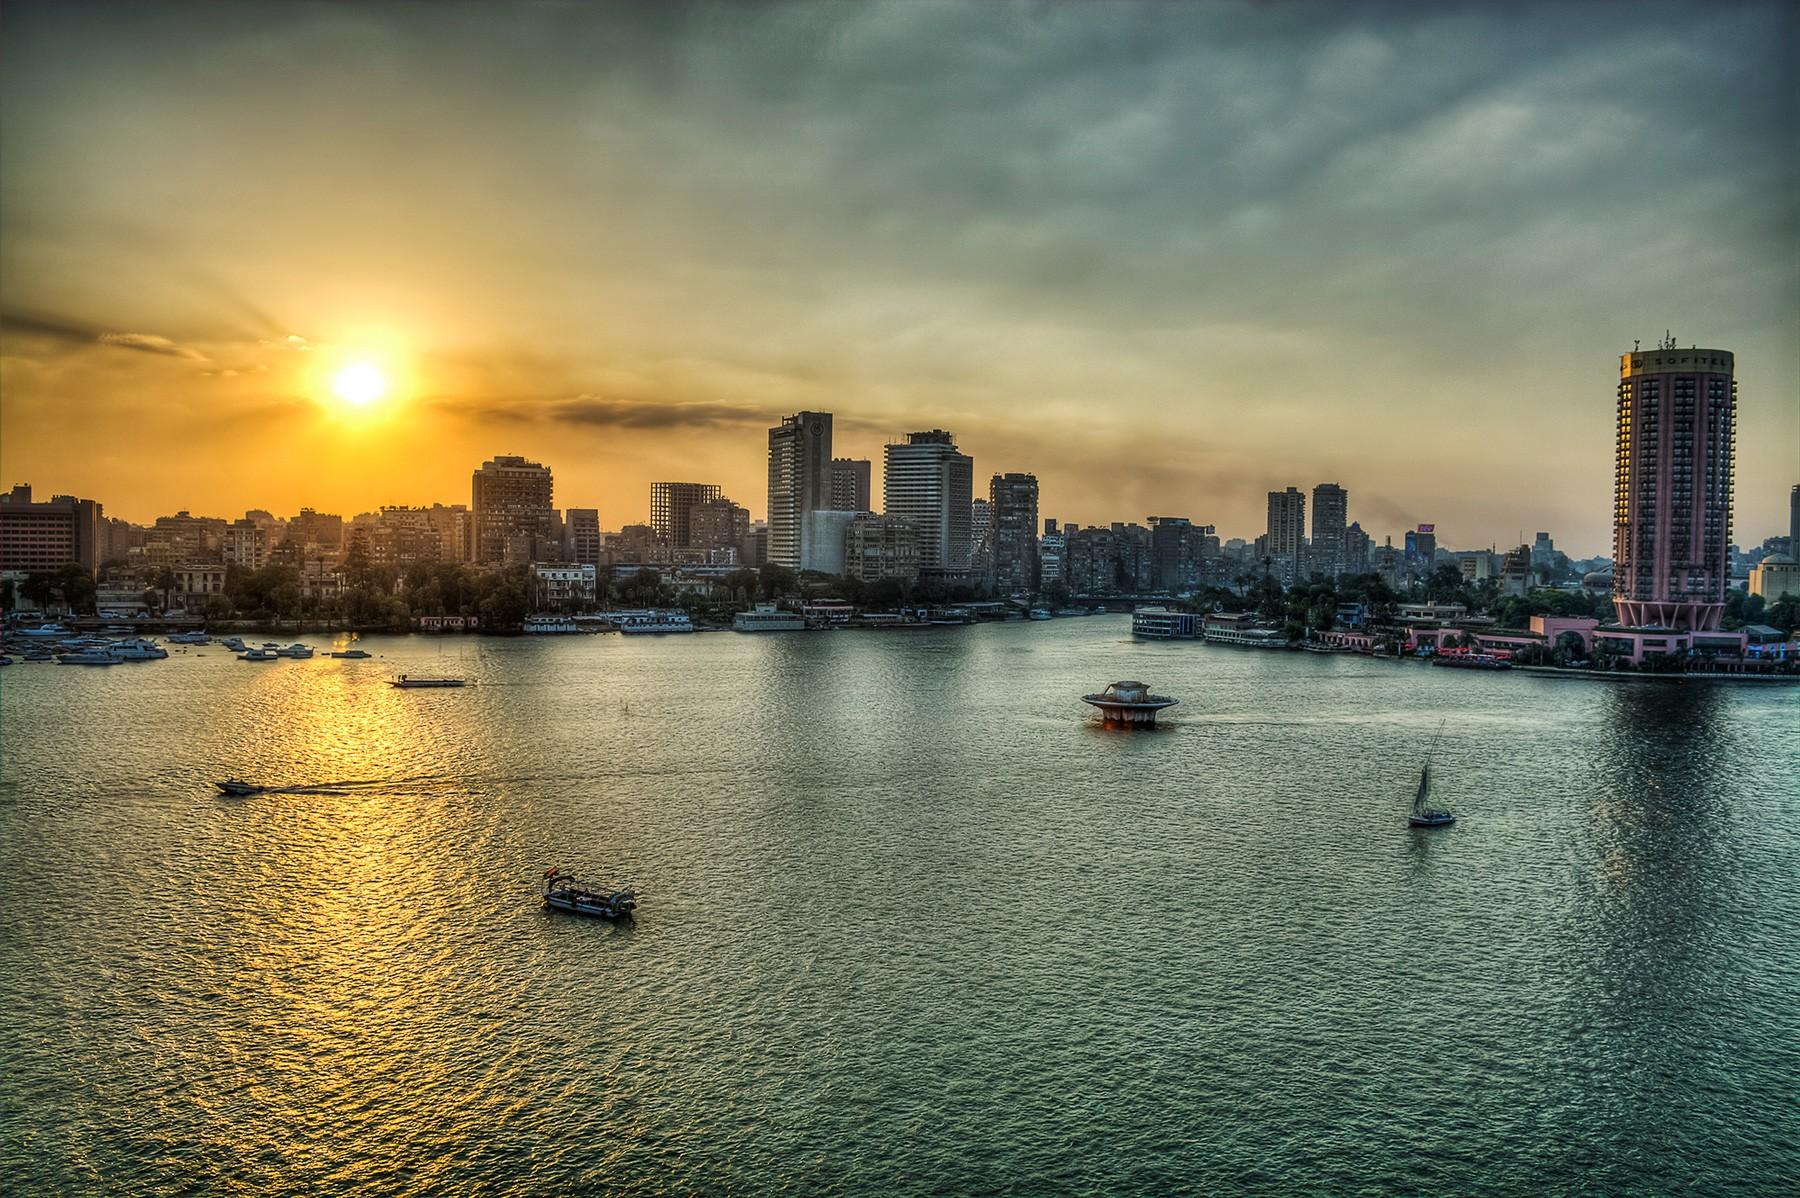 Felucca Ride-SailBoat Nile in Cairo